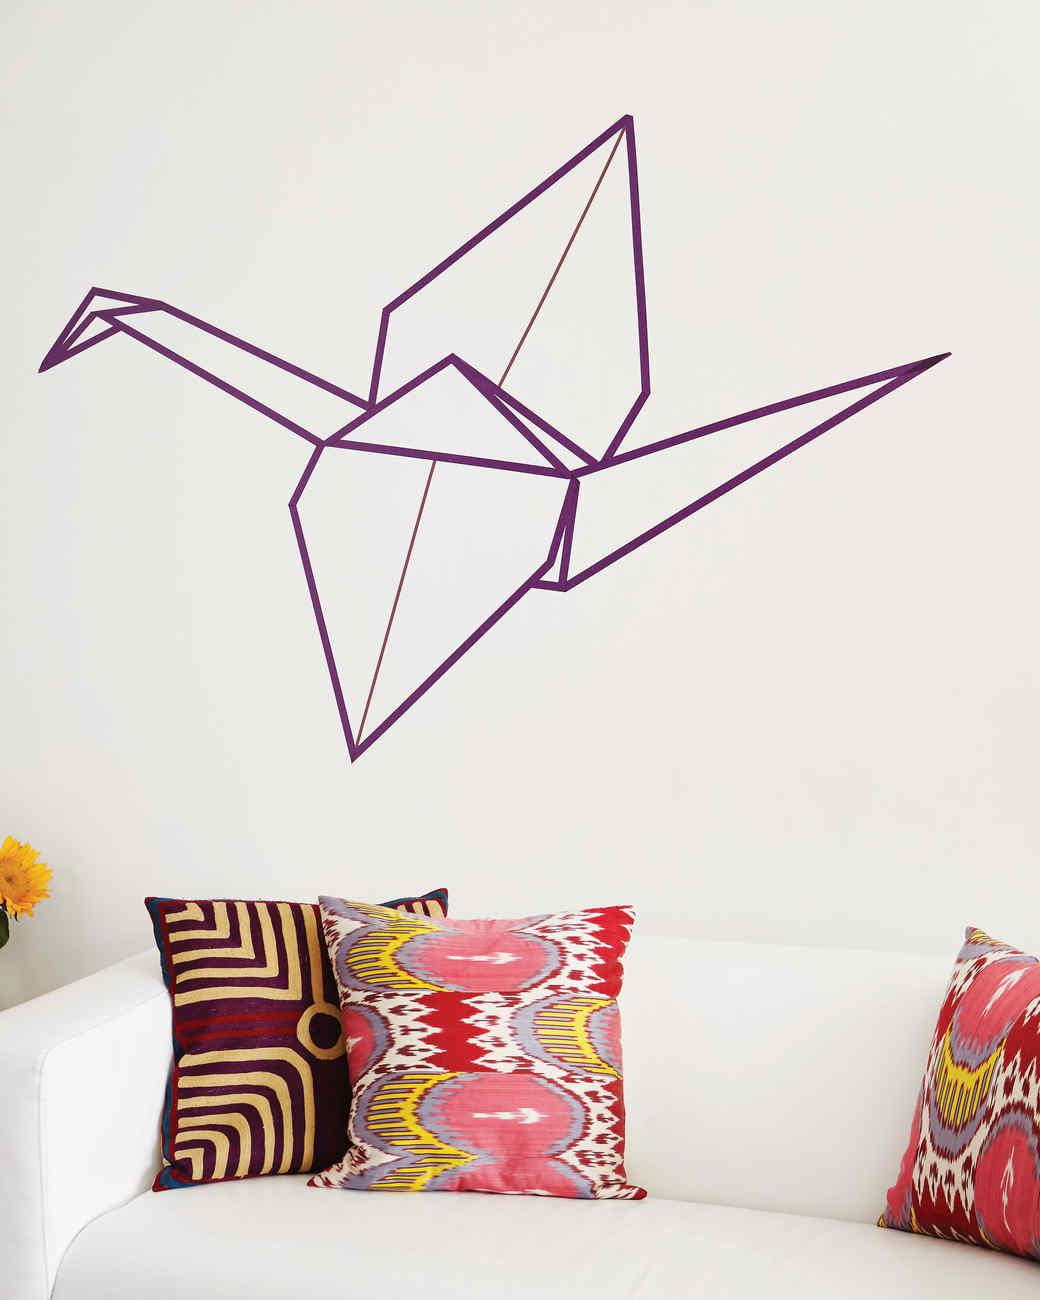 Washi tape origami crane wall art martha stewart for Washi tape wall designs